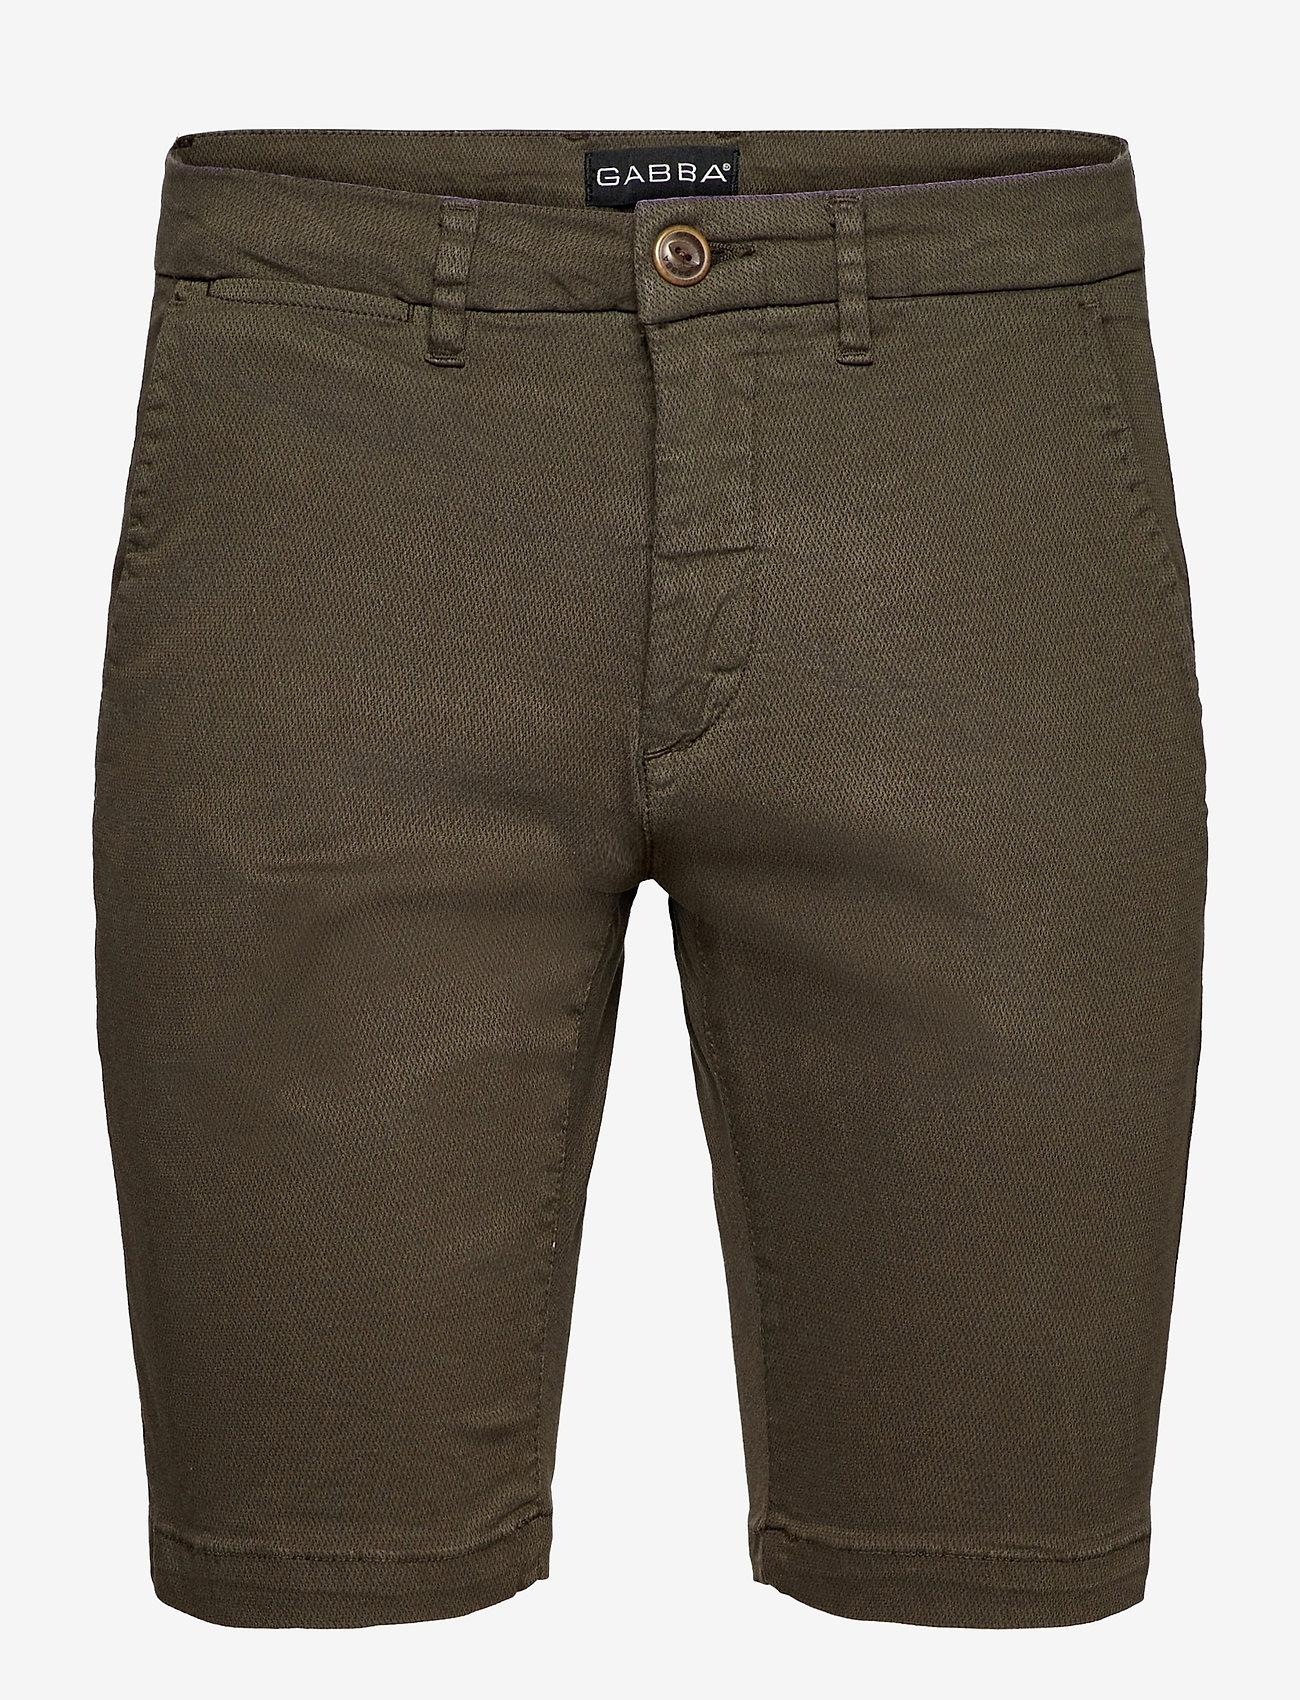 Gabba - Jason K3280 Dale Shorts - chinos shorts - army - 0